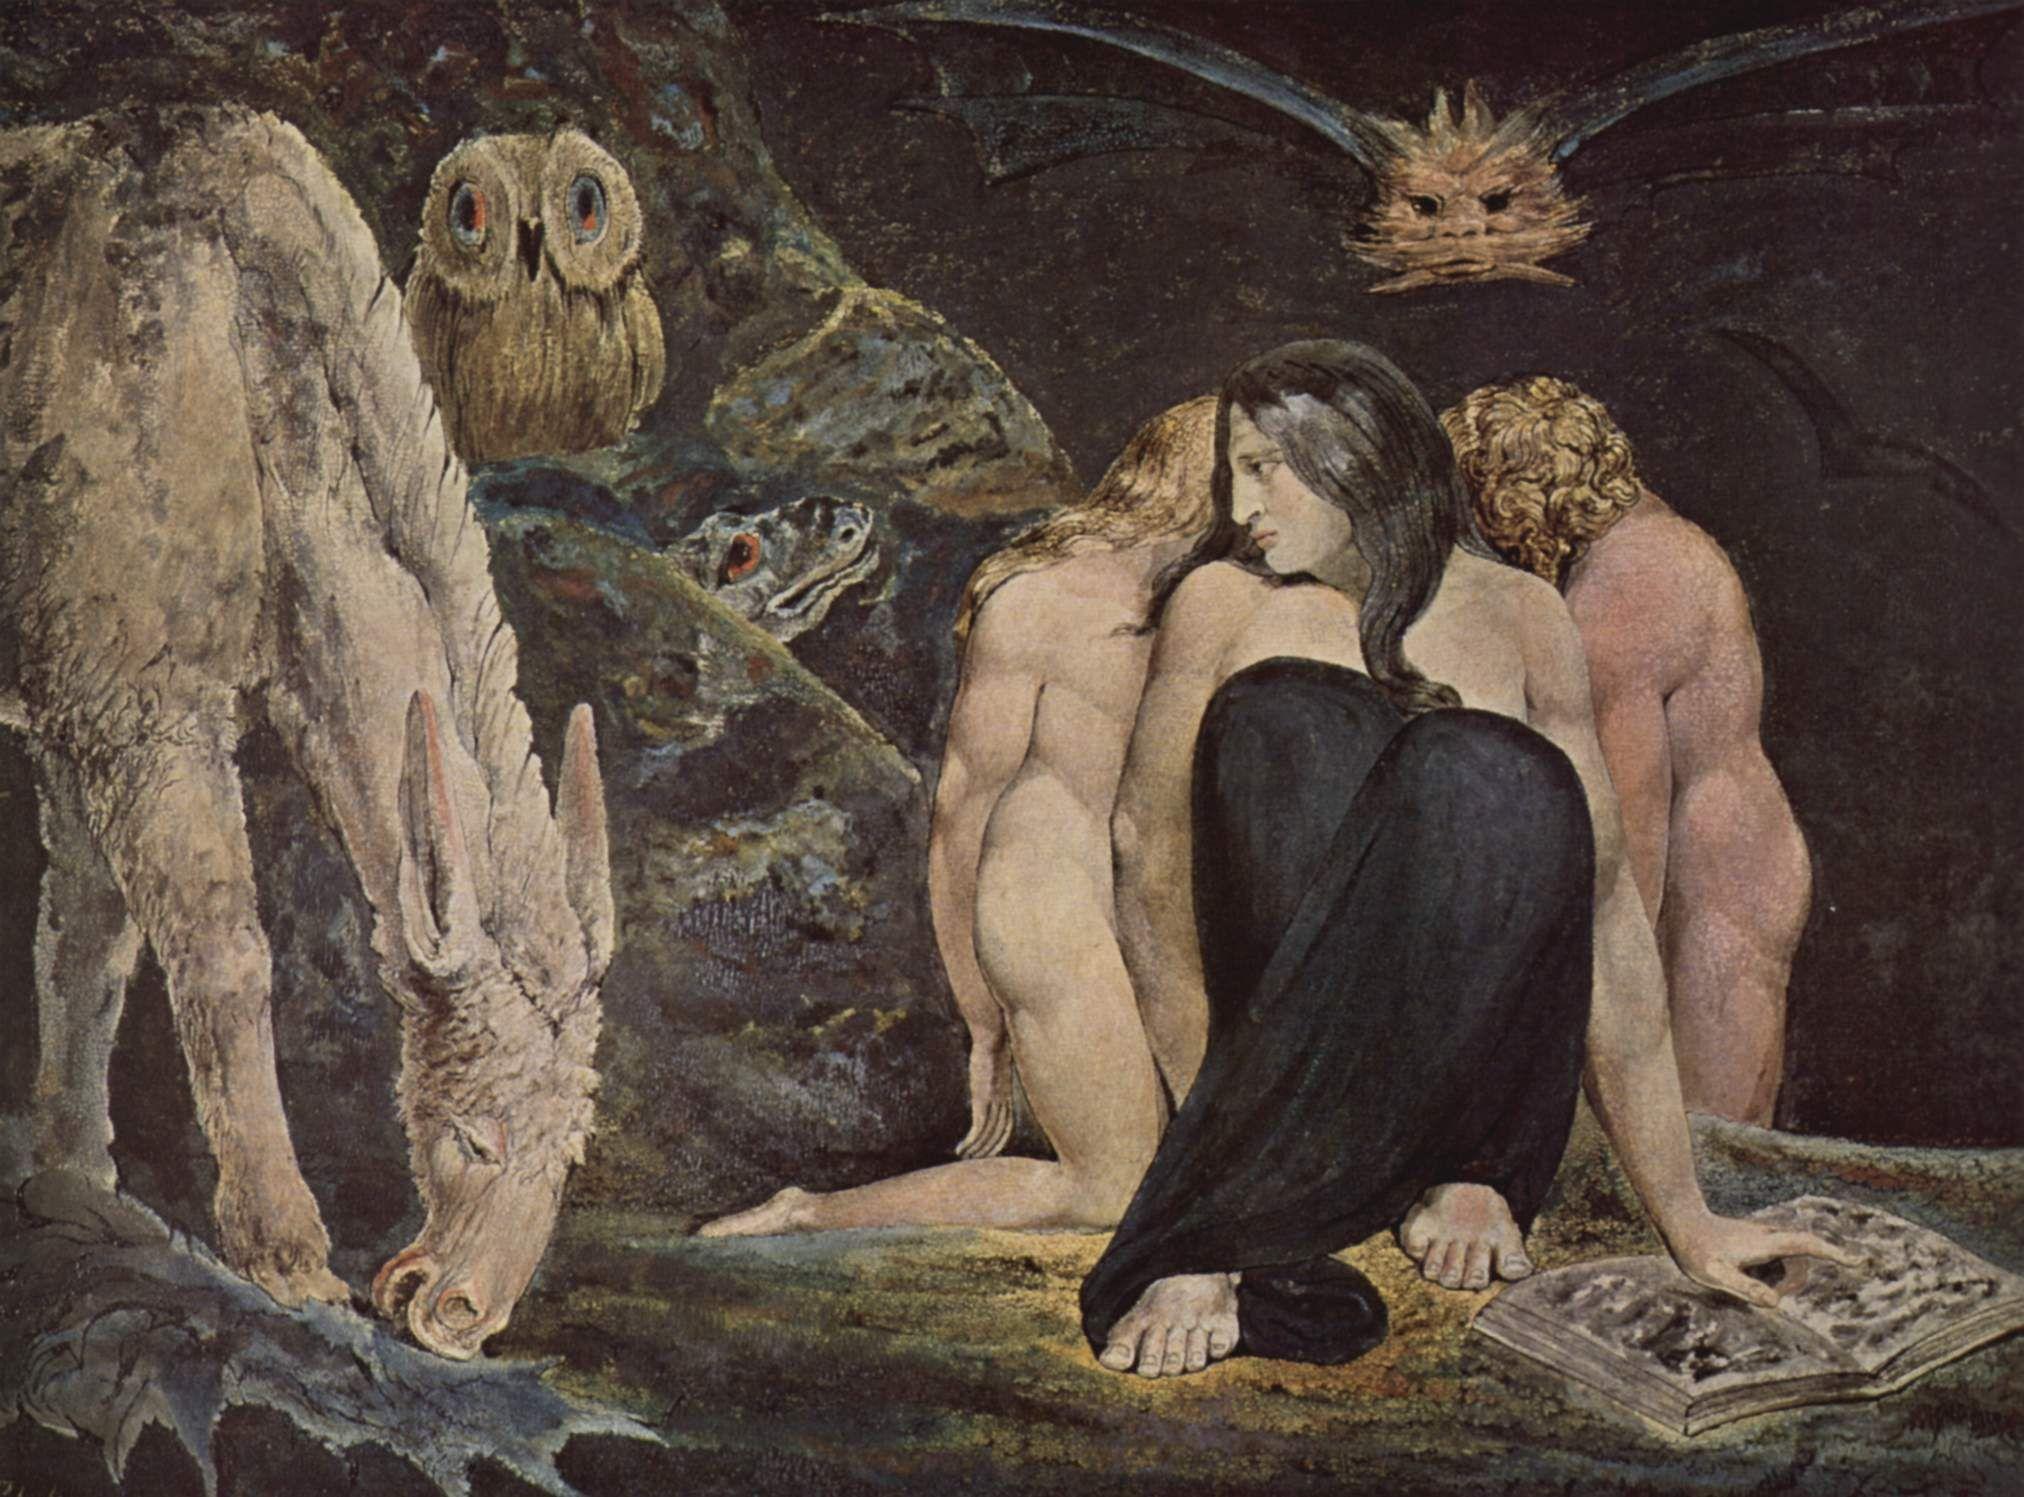 Hecate The Night Of Enitharmons Joy William Blake Symbolism